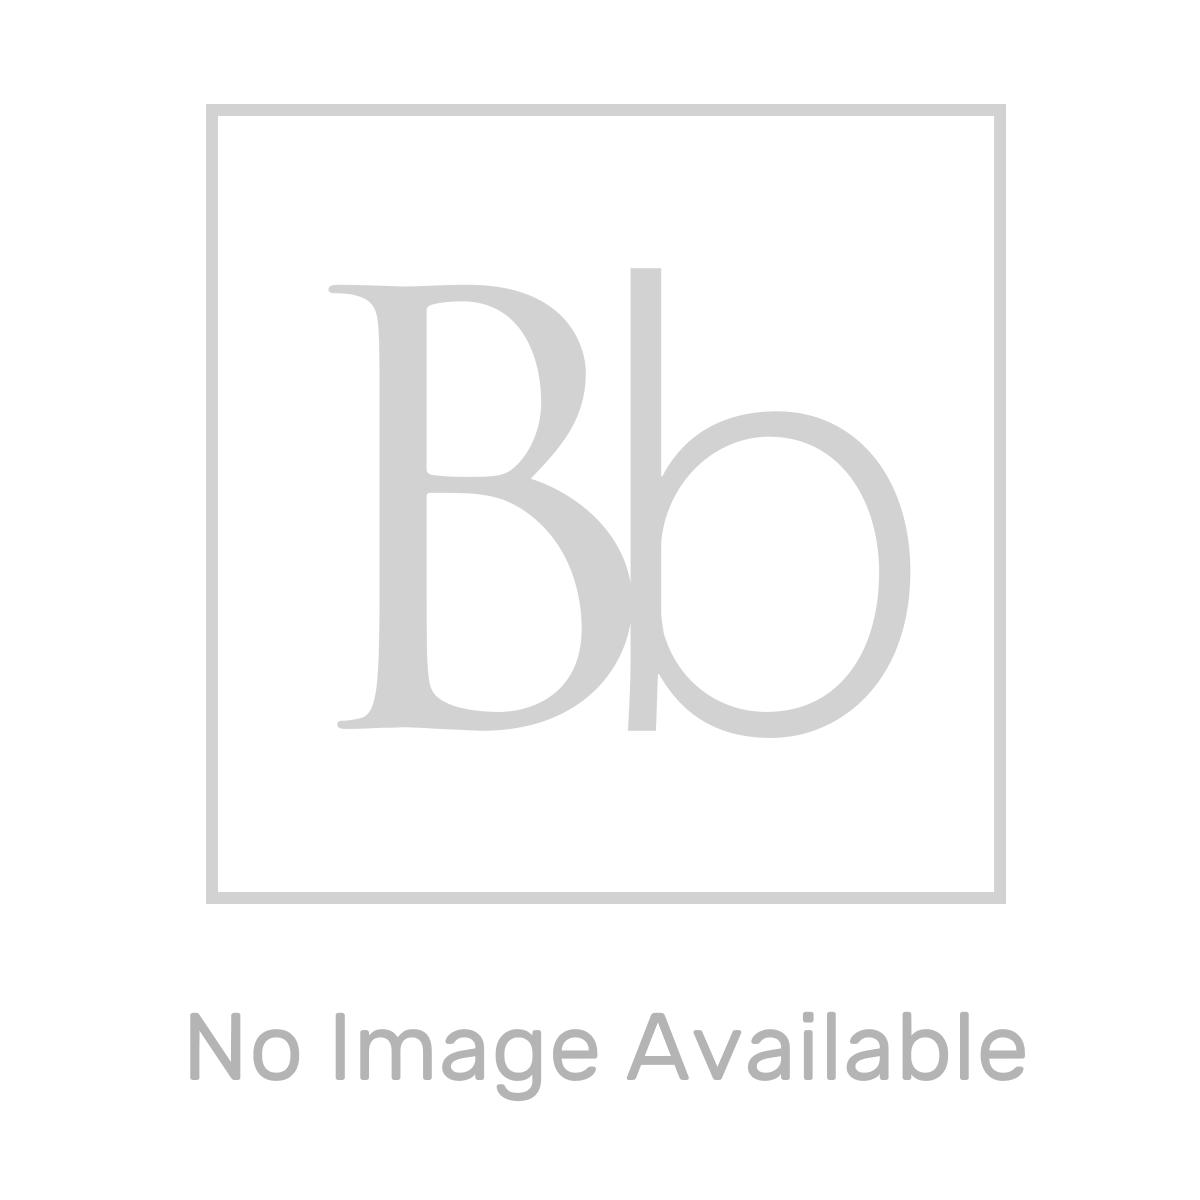 Nuie Athena Stone Grey 2 Door Floor Standing Vanity Unit with 50mm Profile Basin 600mm Line Drawing